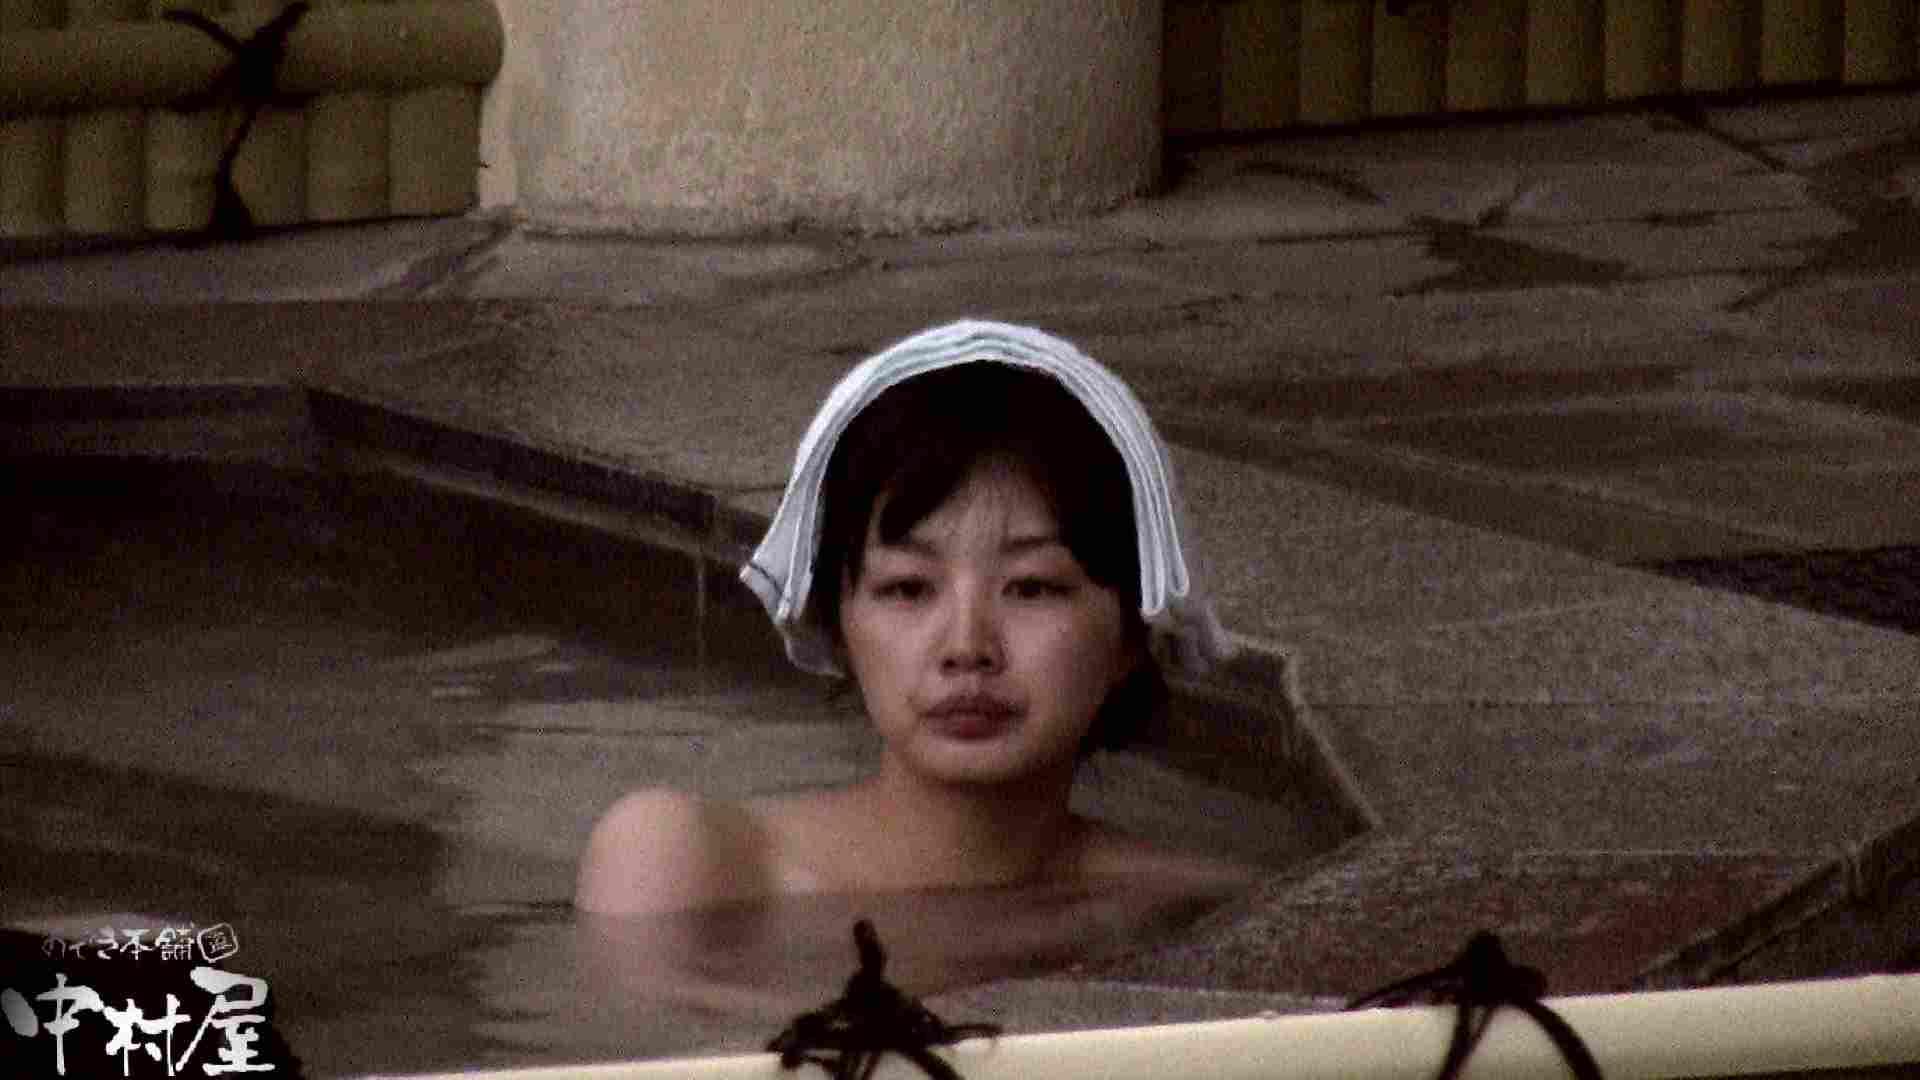 Aquaな露天風呂Vol.916 盗撮大放出 盗み撮り動画 75連発 30